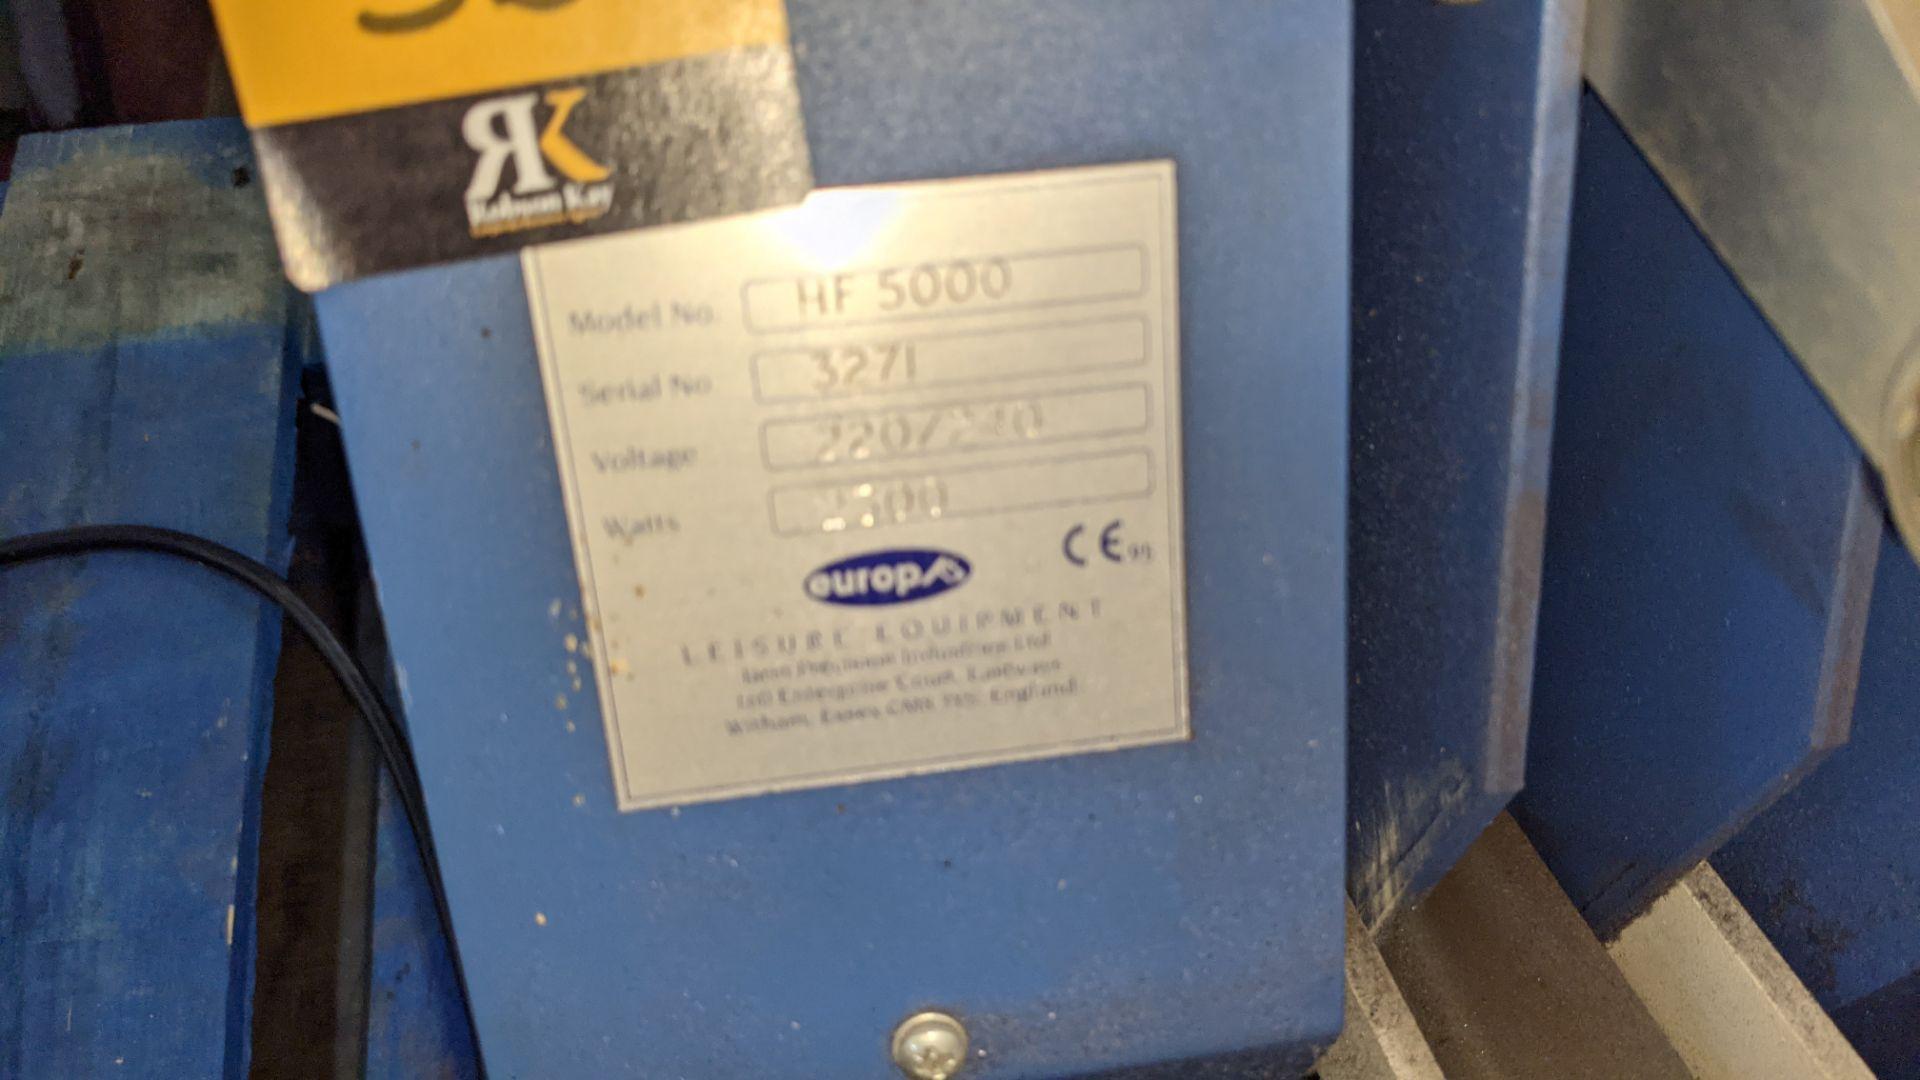 Europa Jarin benchtop heat transfer press model HF5000 - Image 11 of 13